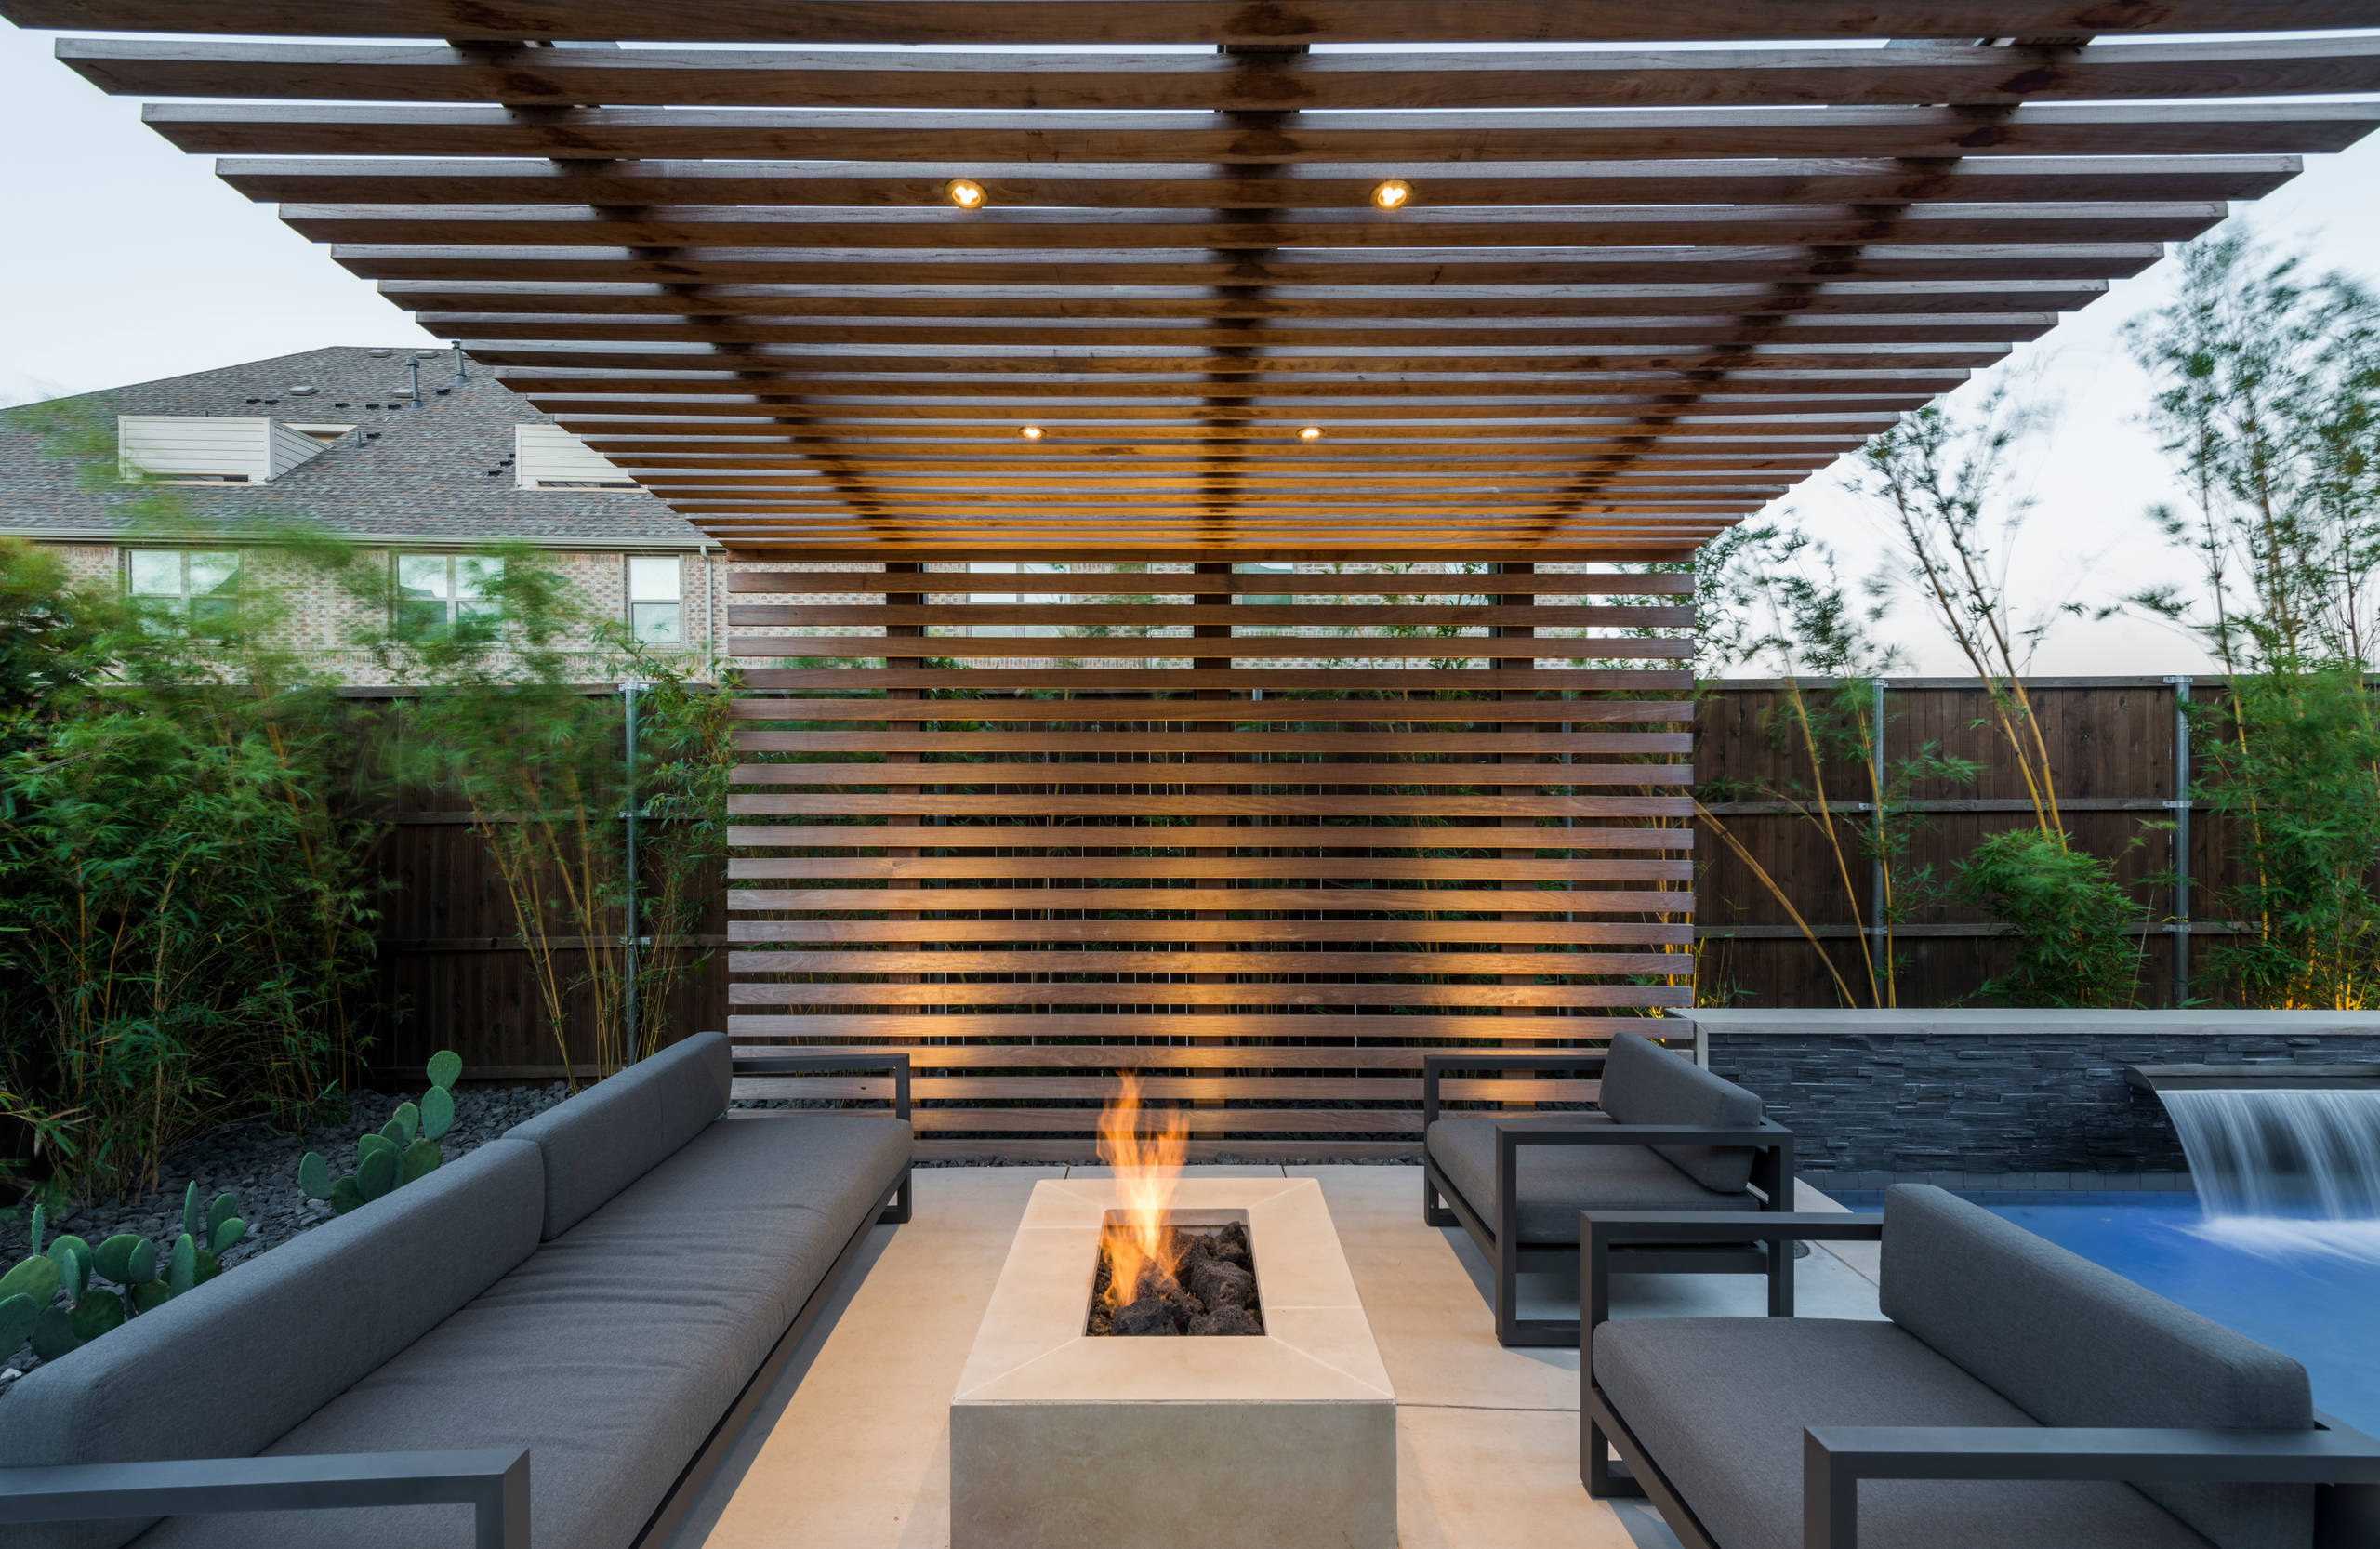 75 beautiful small patio with a pergola